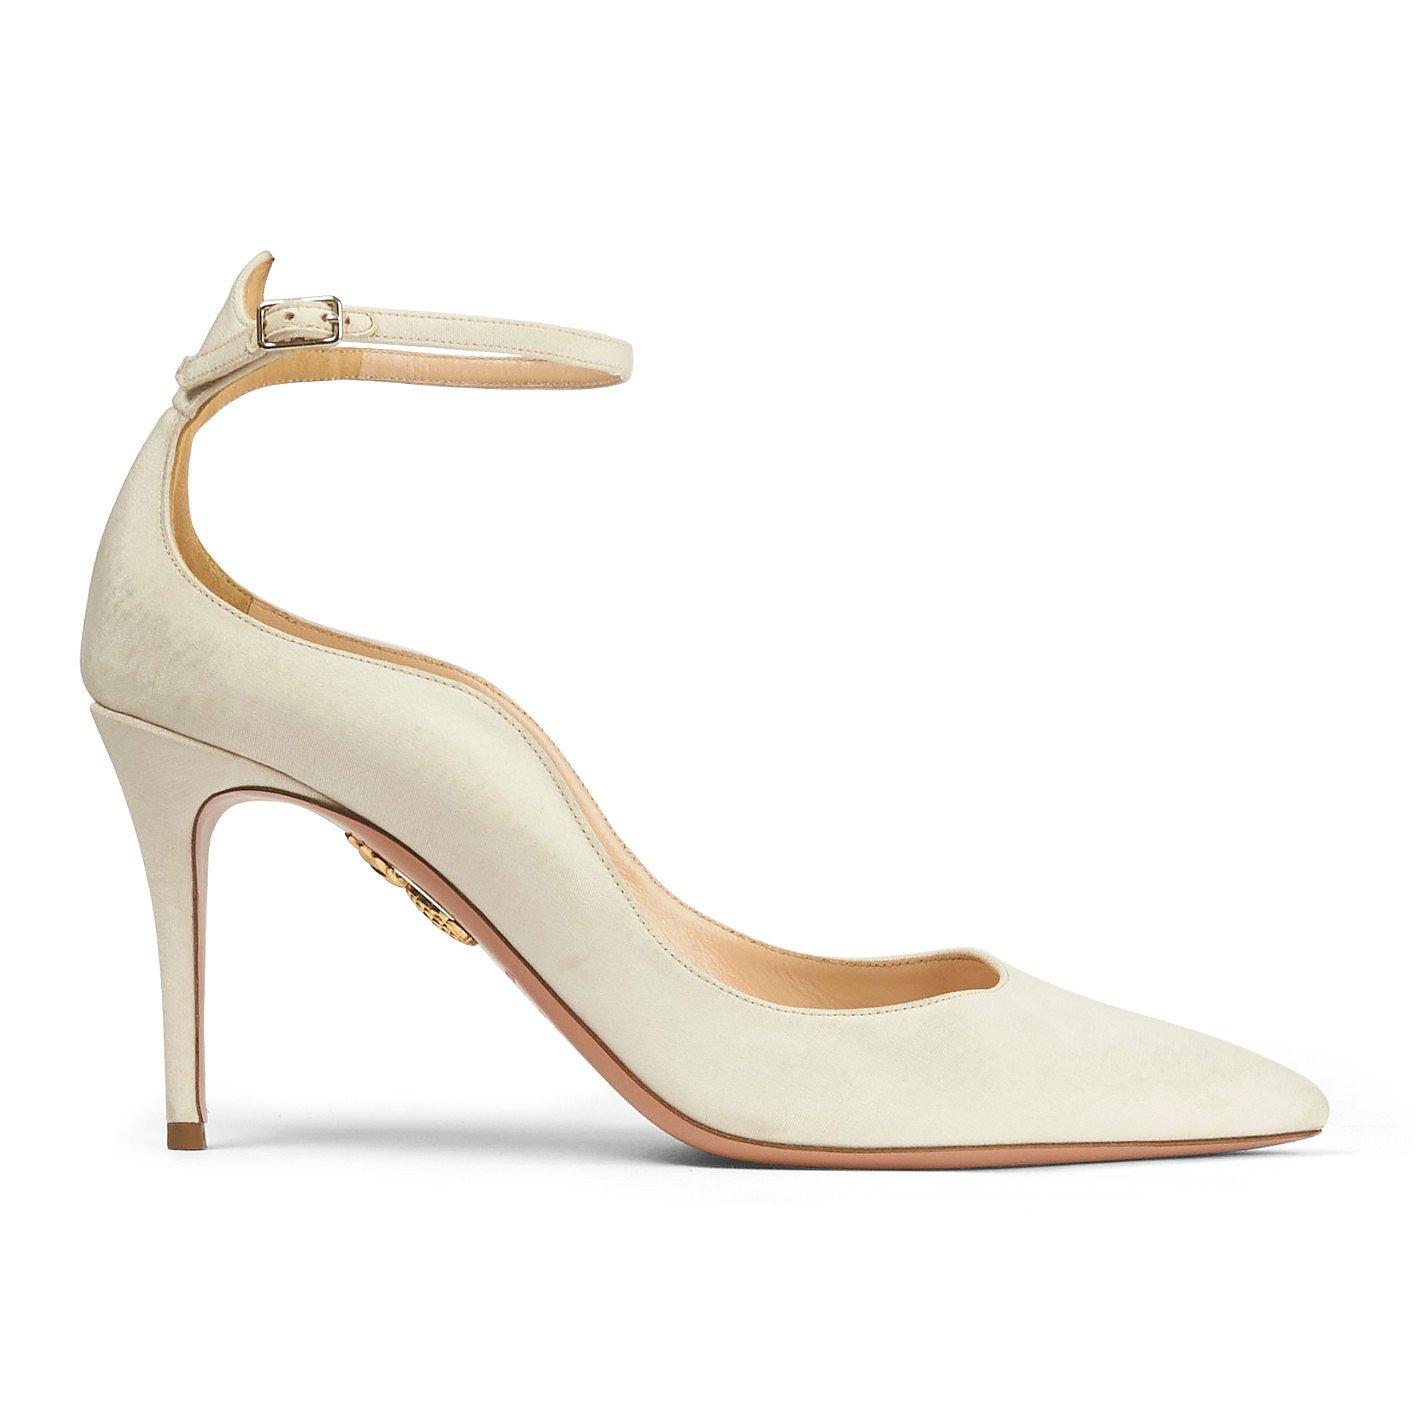 Aquazzura Stiletto Heels with Ankle Strap